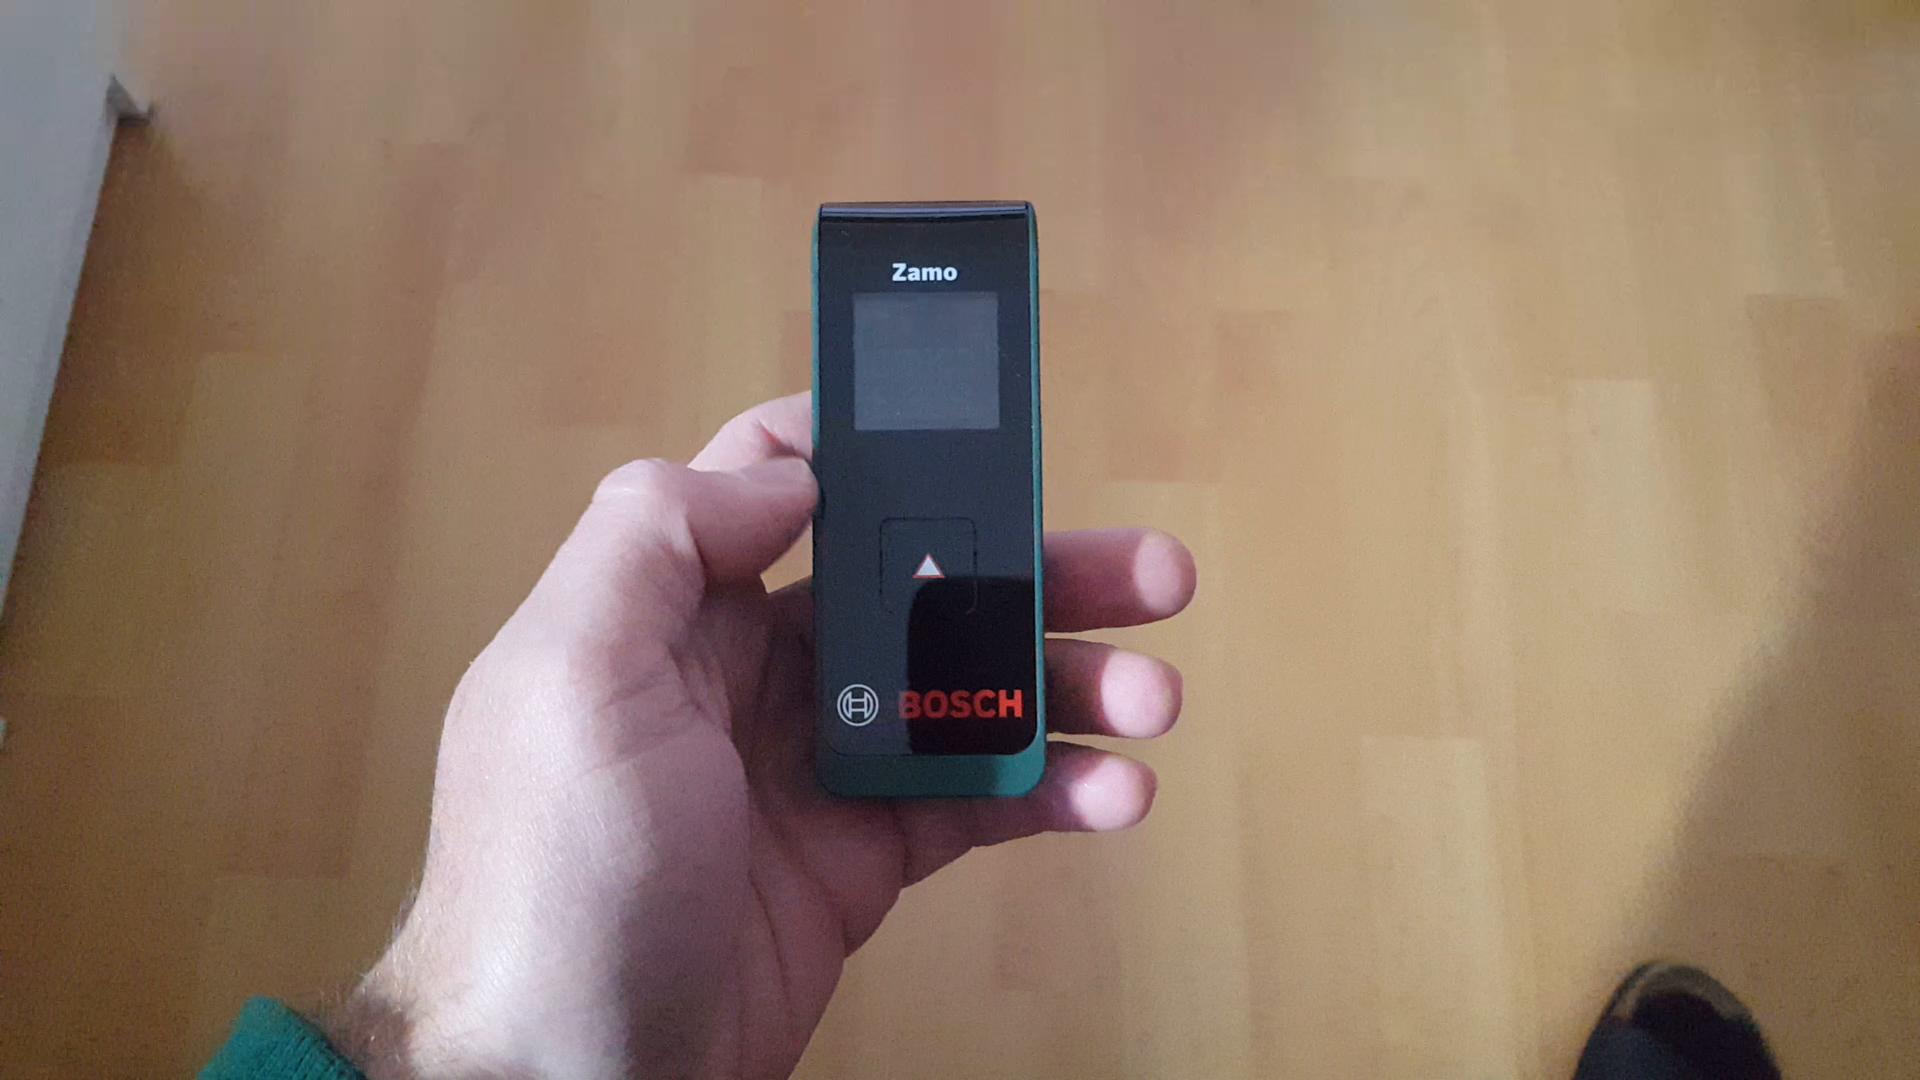 Laser Entfernungsmesser Zamo : Plr bosch digitaler laser entfernungsmesser